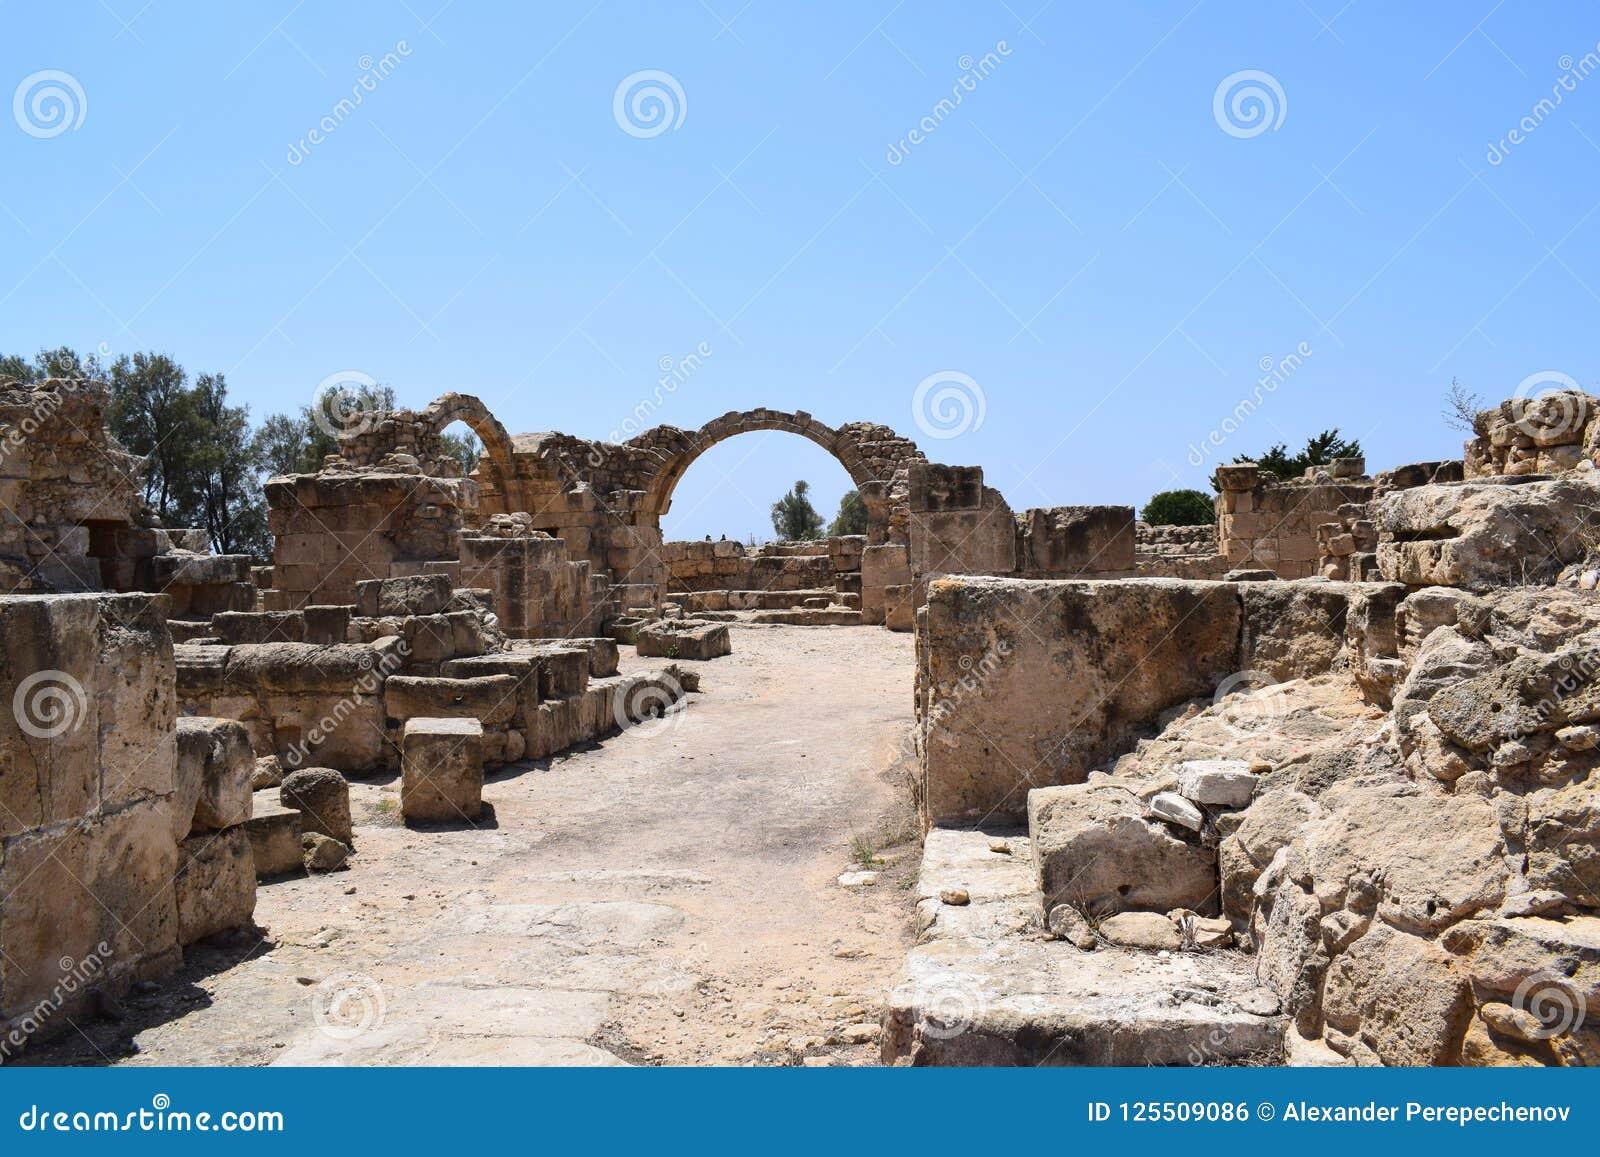 Het Kasteelruïnes van Sarandakolones, Cyprus